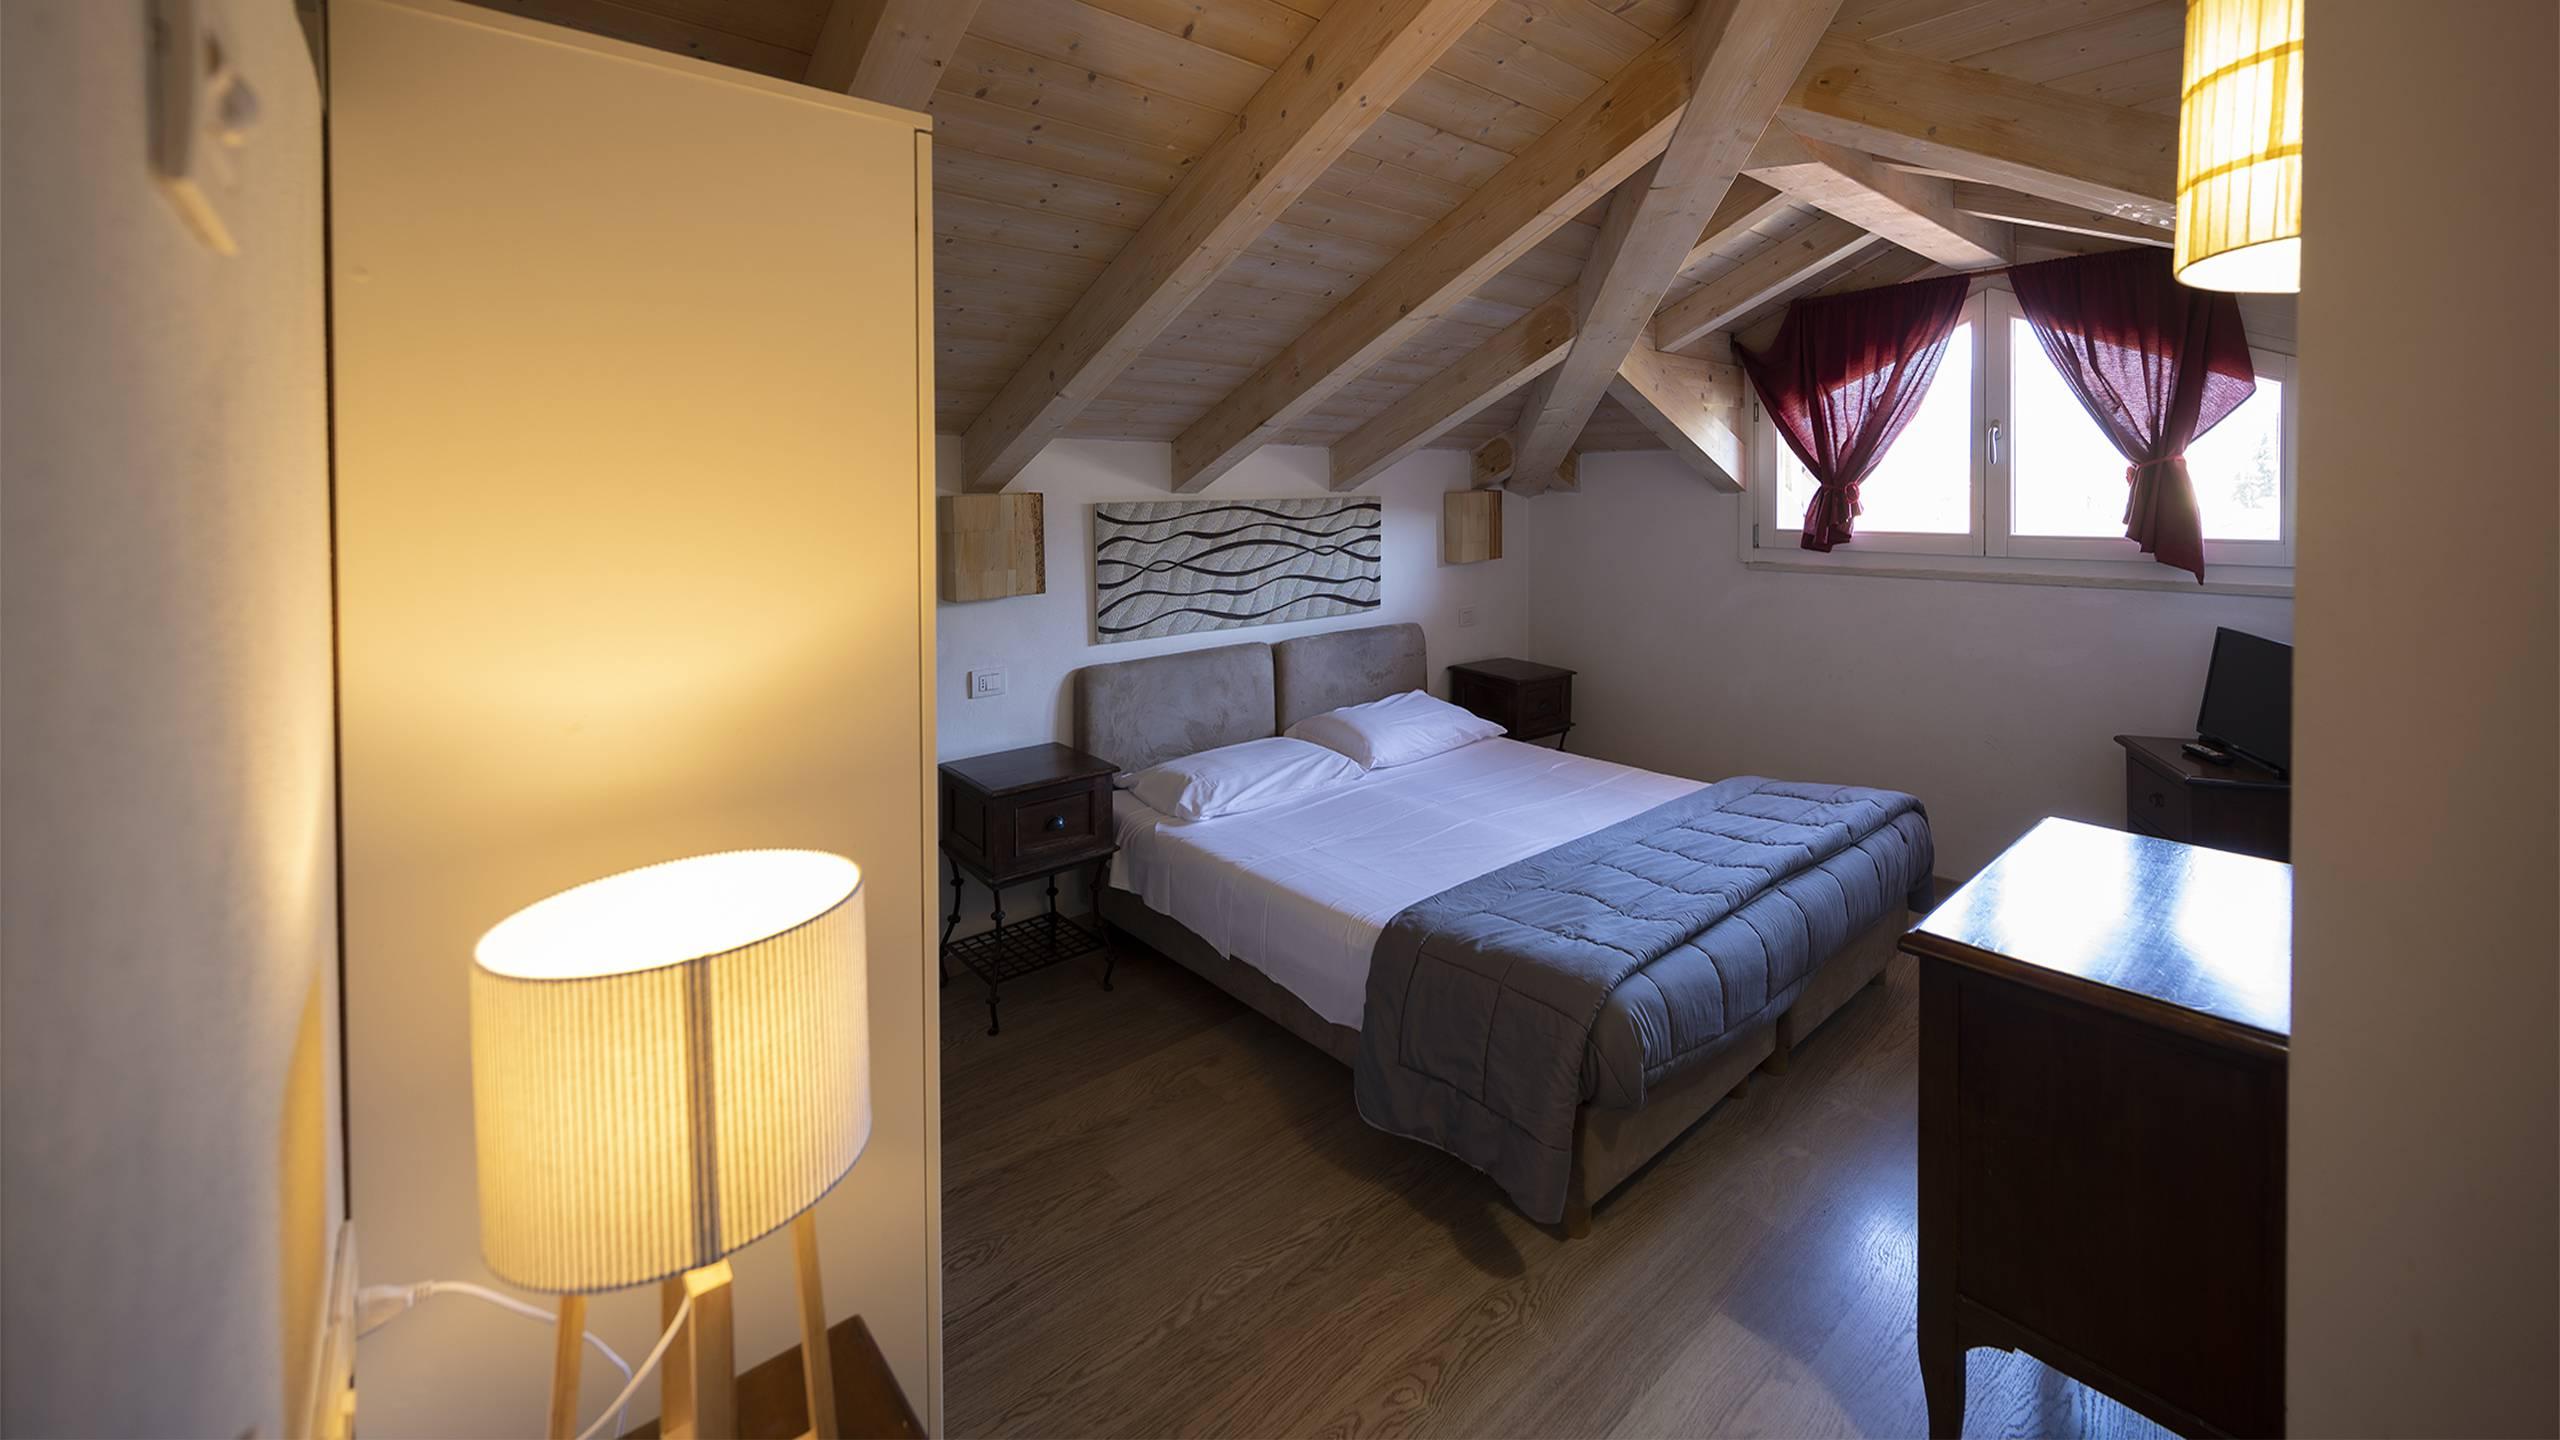 Villa-Bellaria-Bed-and-Breakfast-Riva-del-Garda-Dachboden-DSC0988